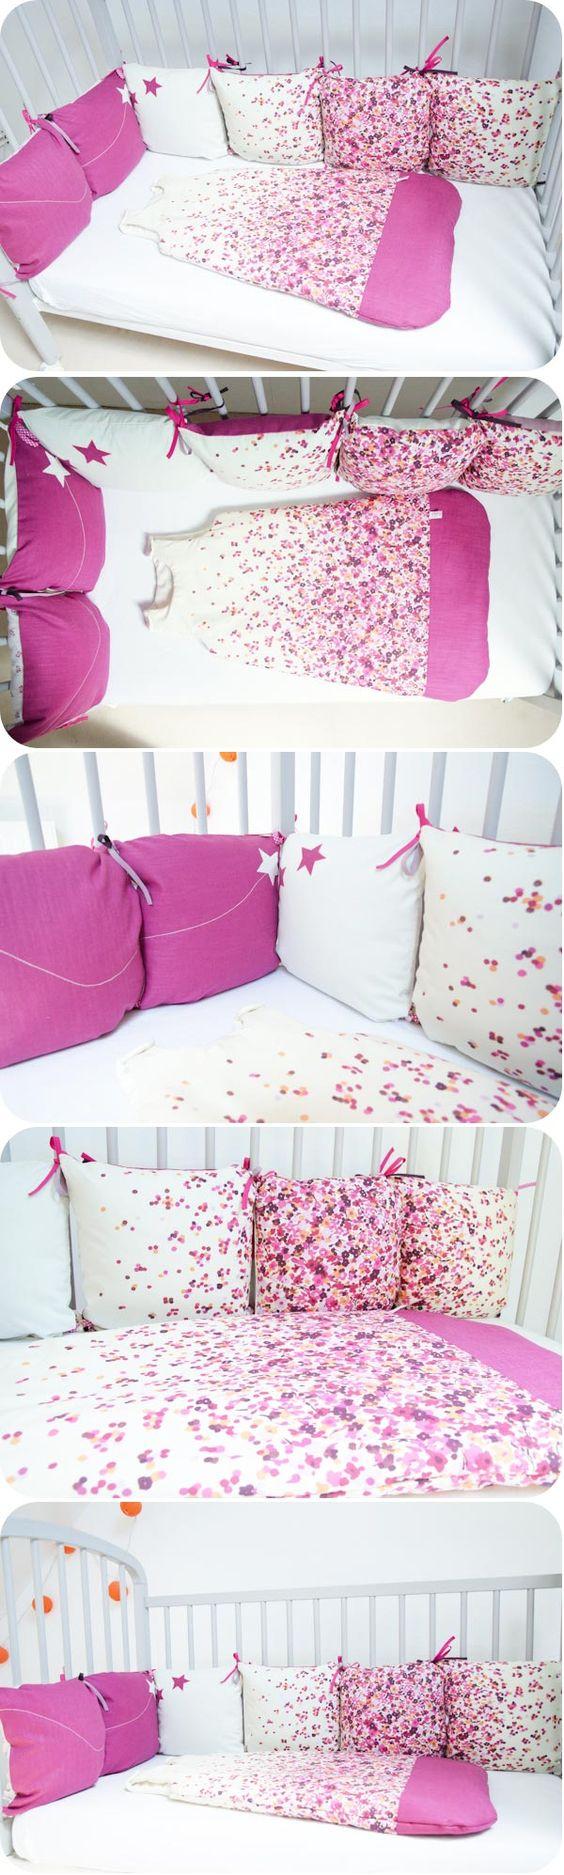 turbulette tour lit coussins baby pinterest roses et b b. Black Bedroom Furniture Sets. Home Design Ideas